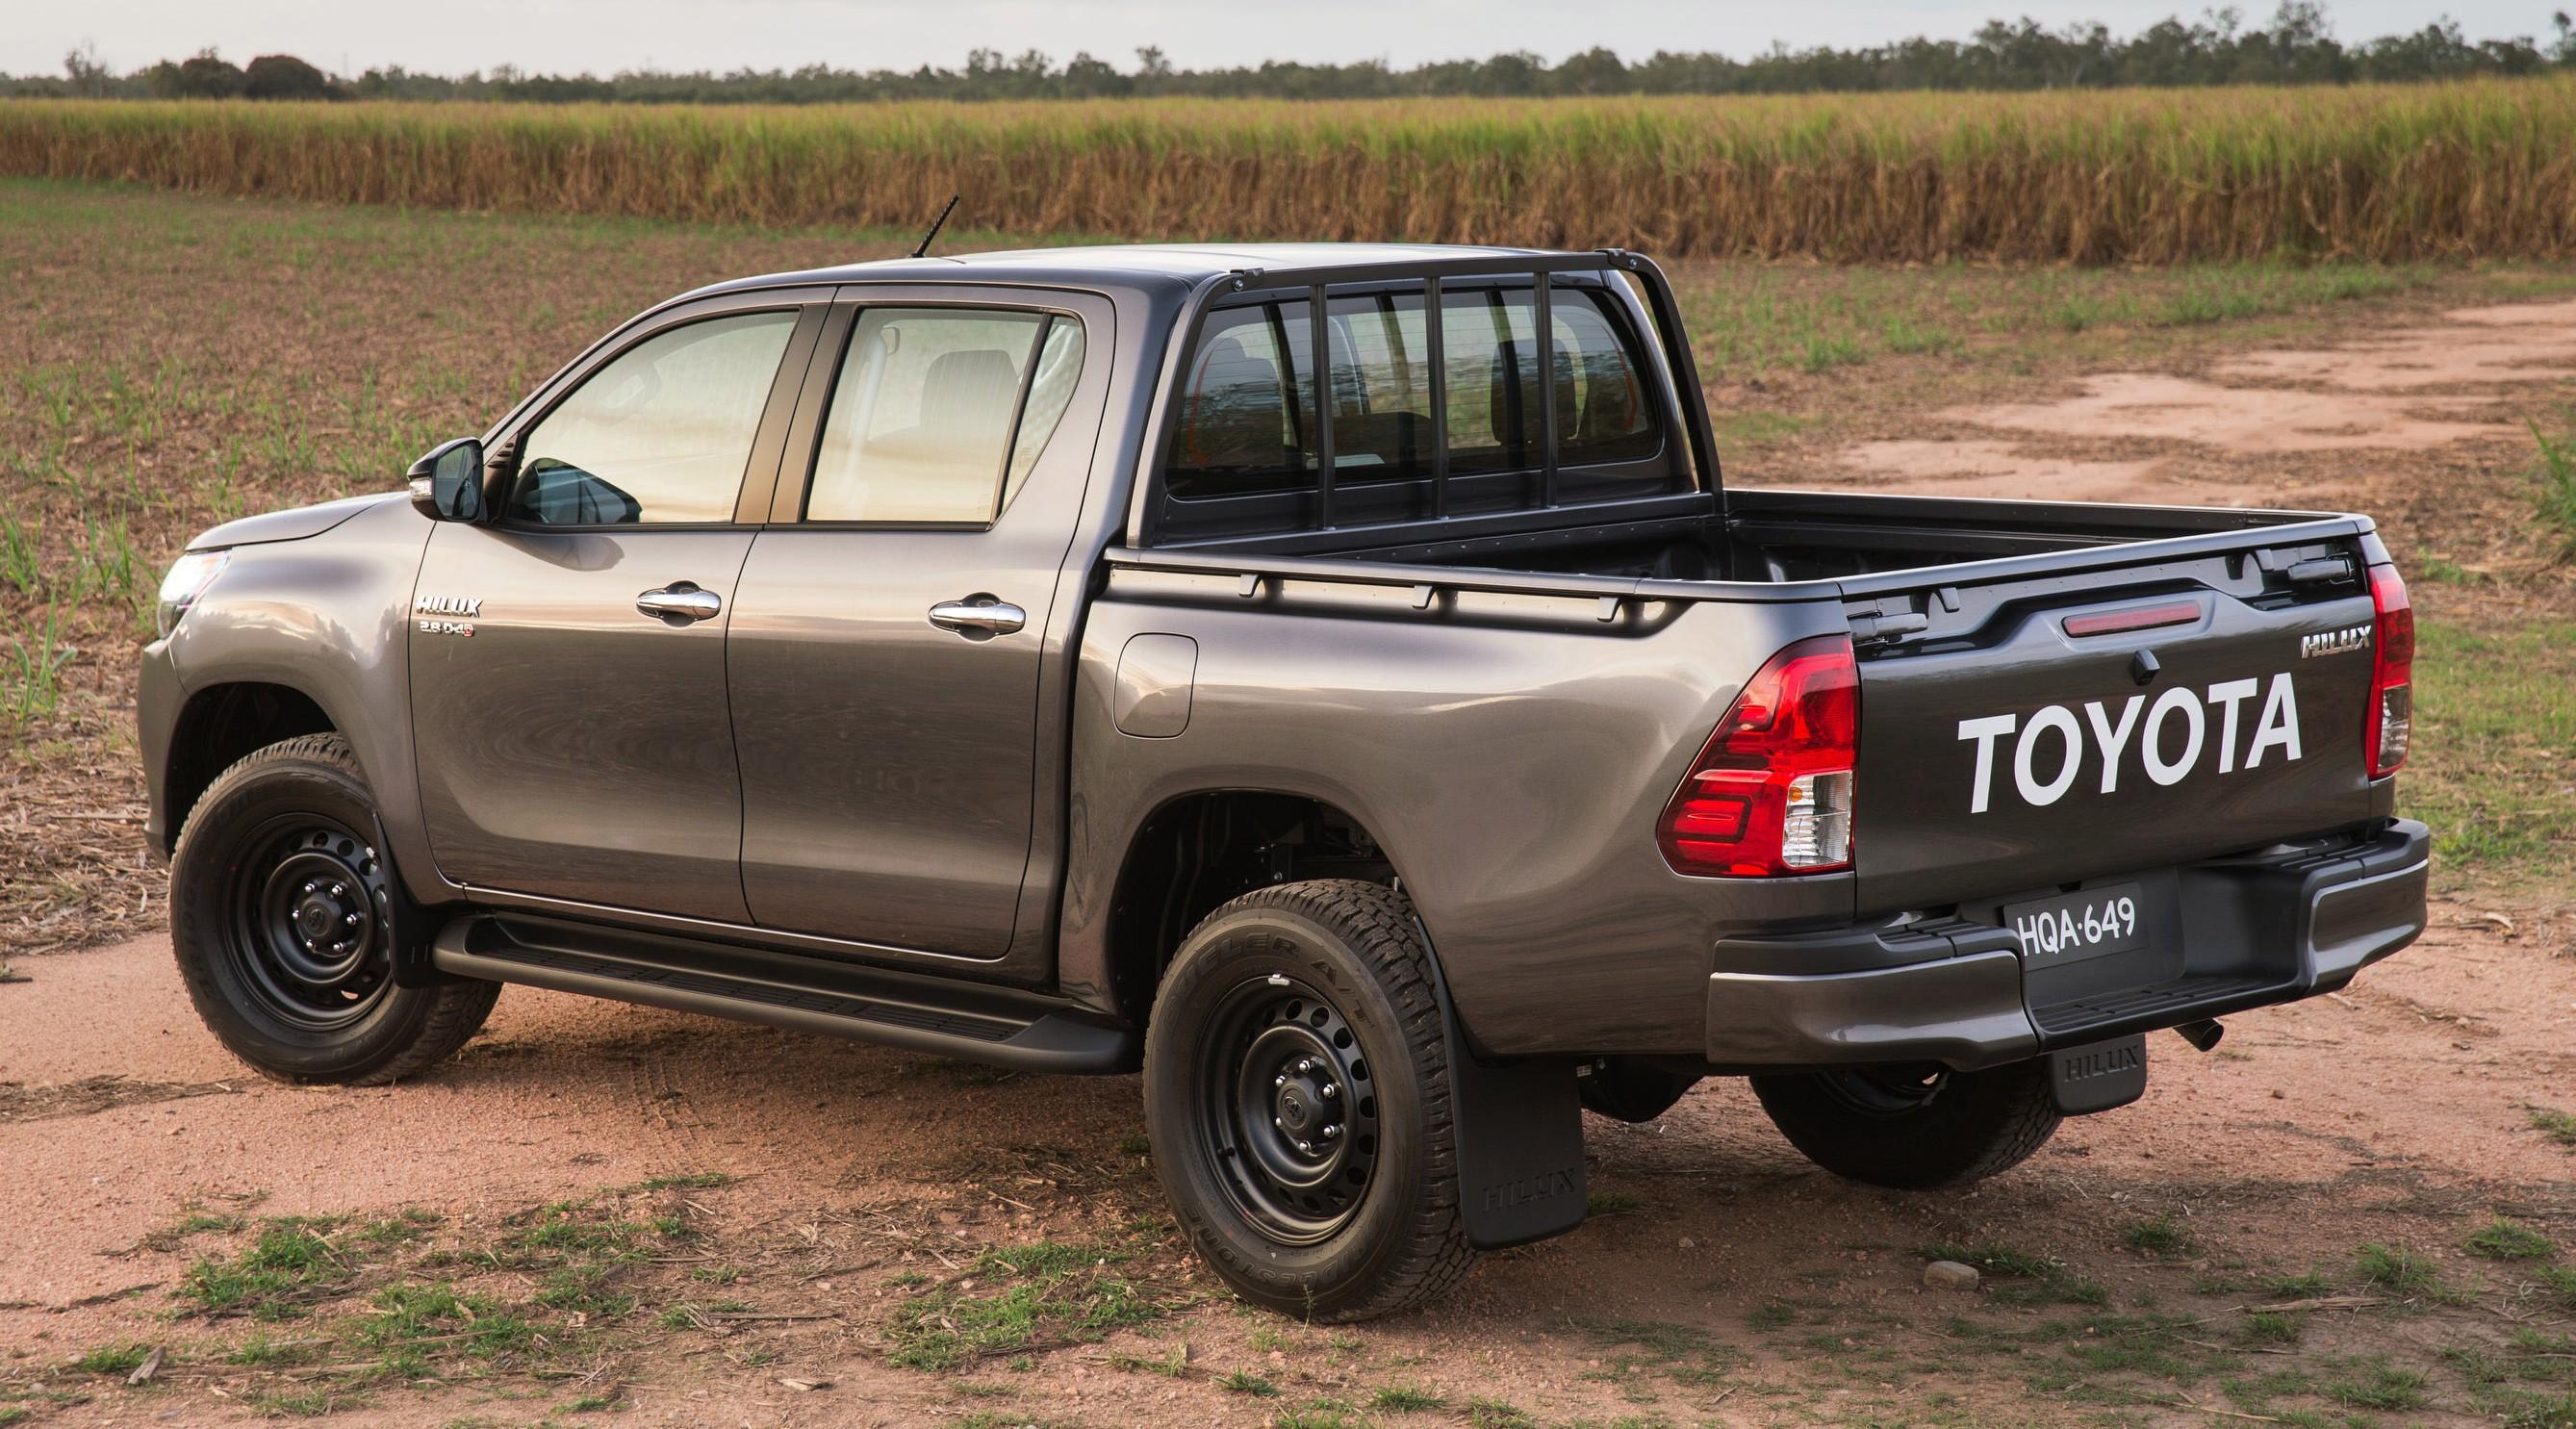 toyota hilux australian specs variants detailed 2016 toyota hilux 2015 ...